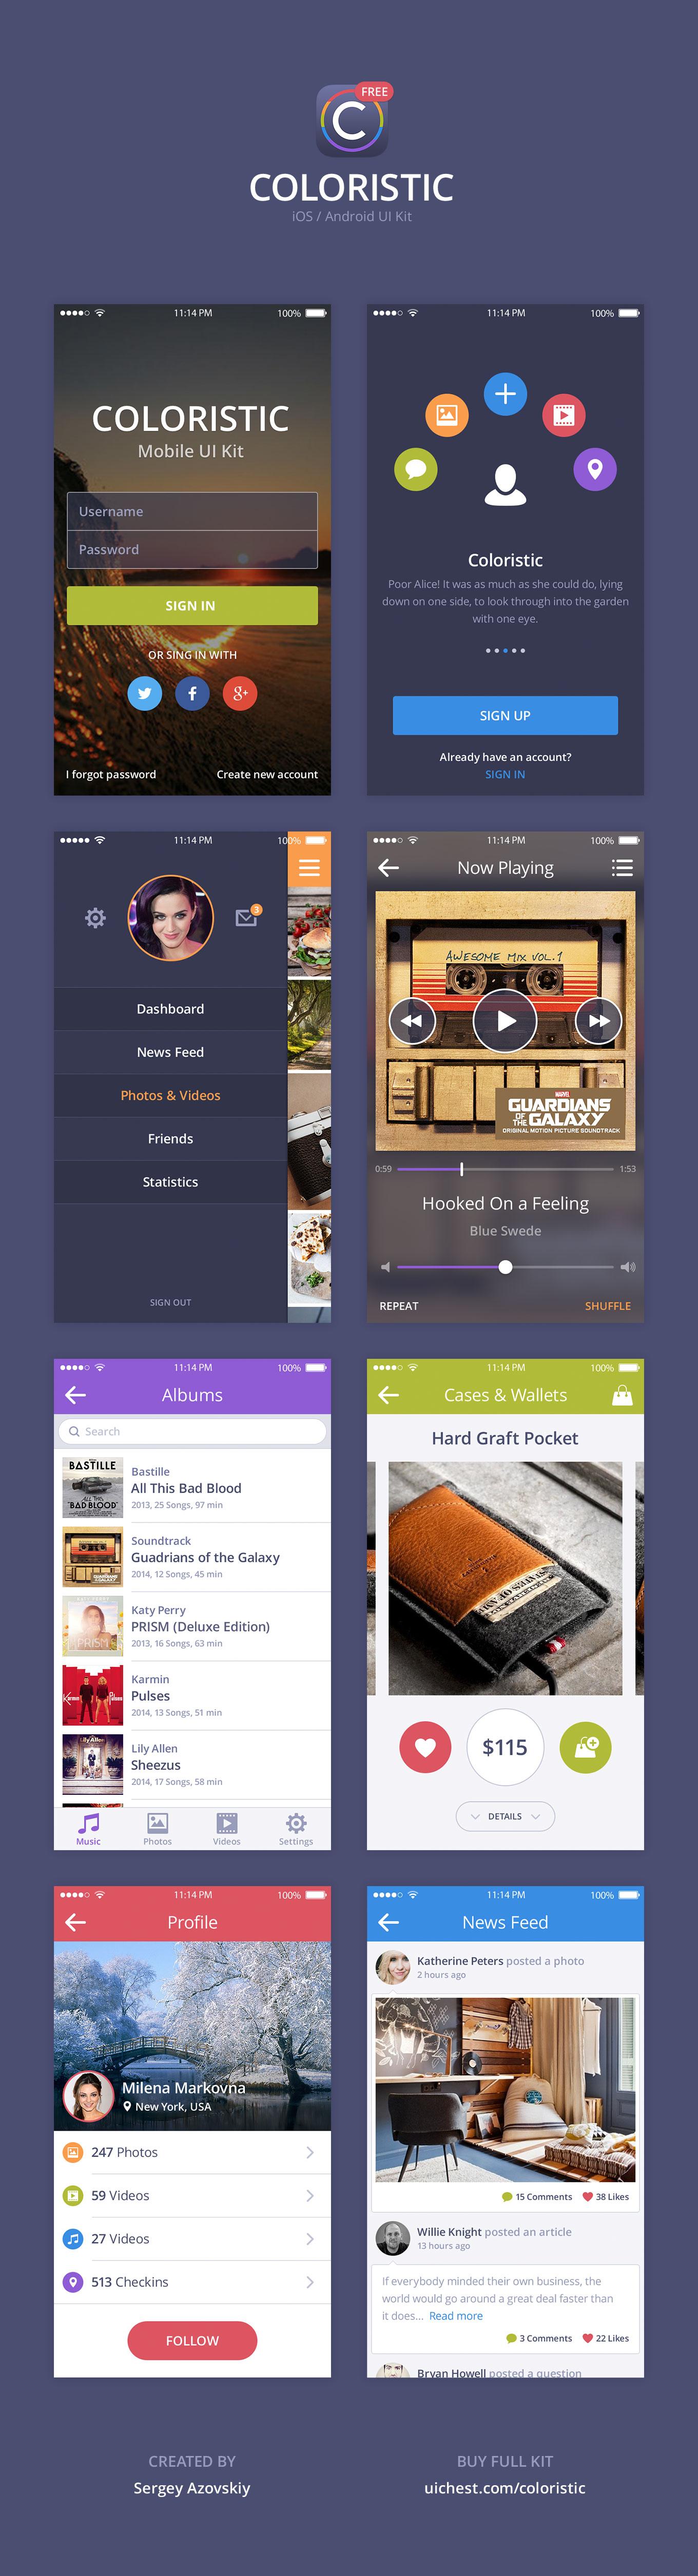 Colorful App UI Kit PSD Freebie